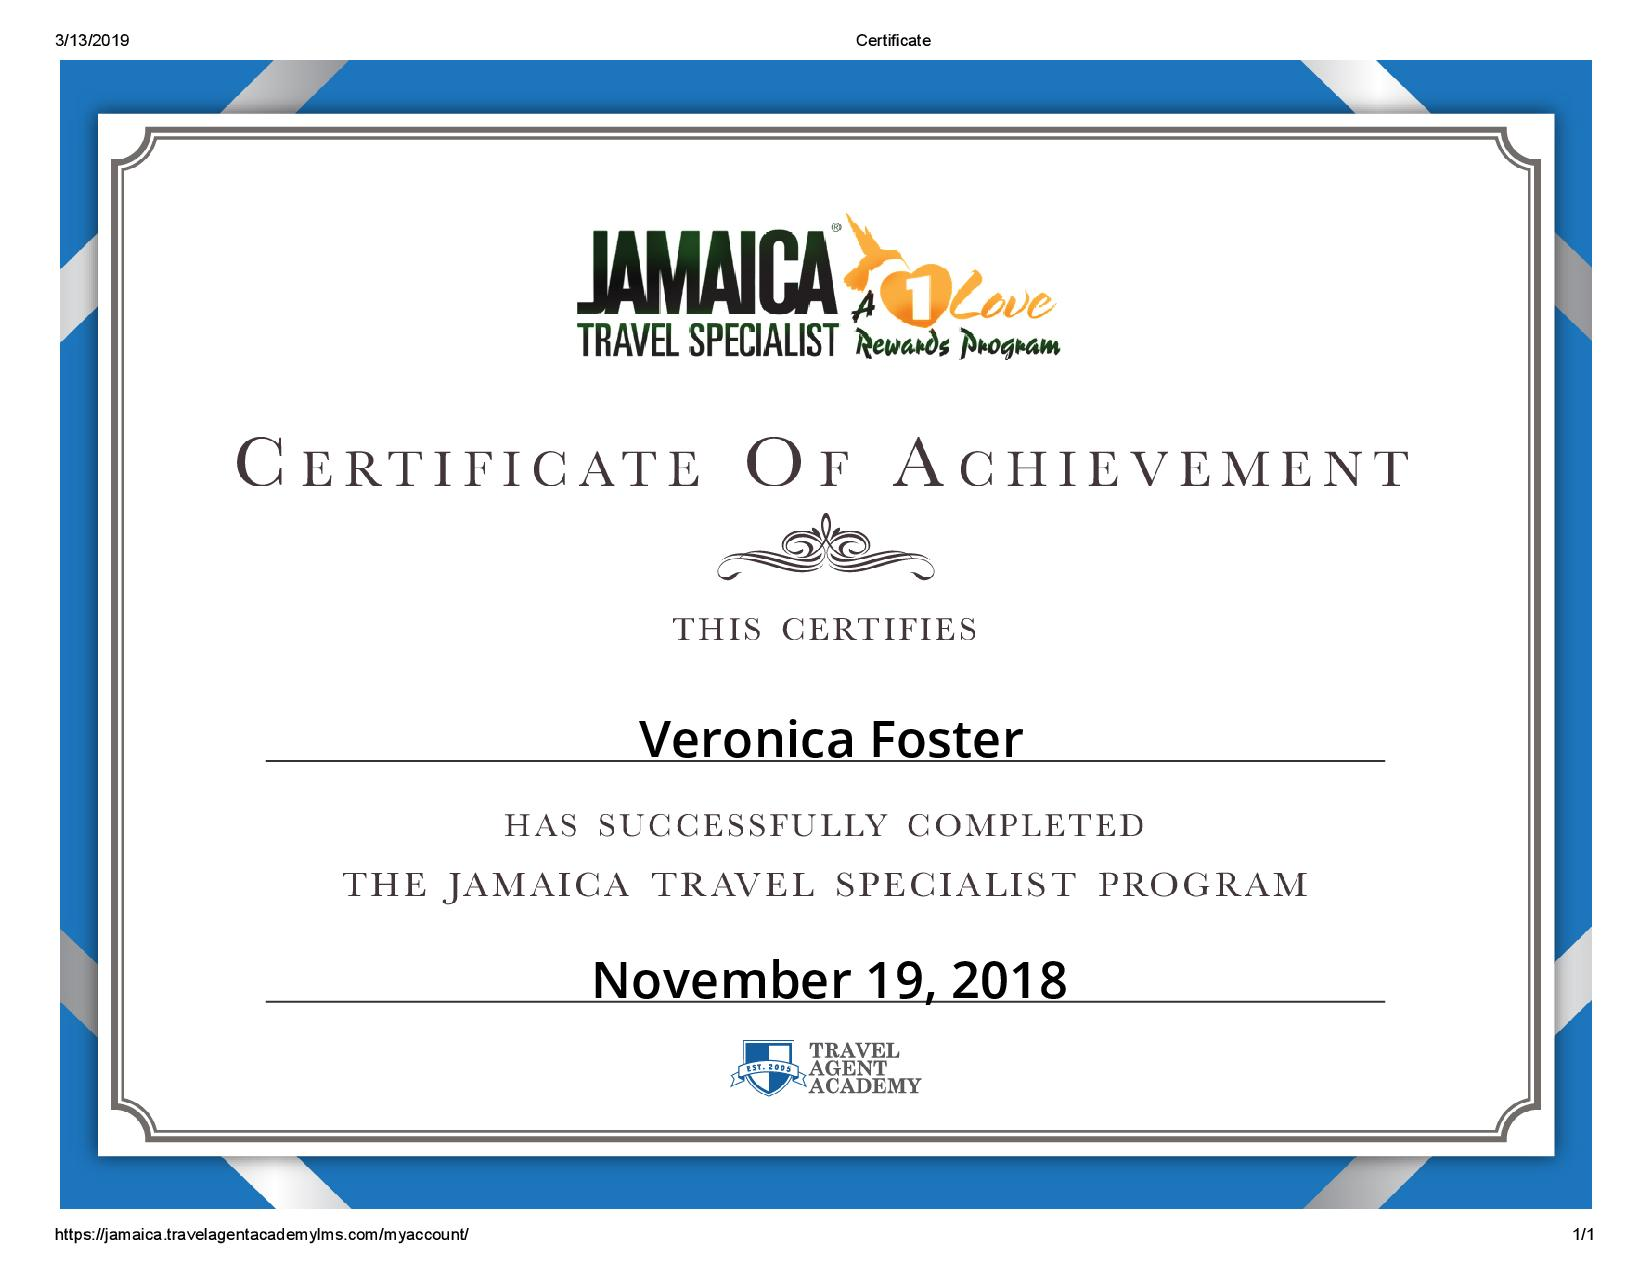 Jamaica Travel Specialist Program - Certificate-page-001.jpg